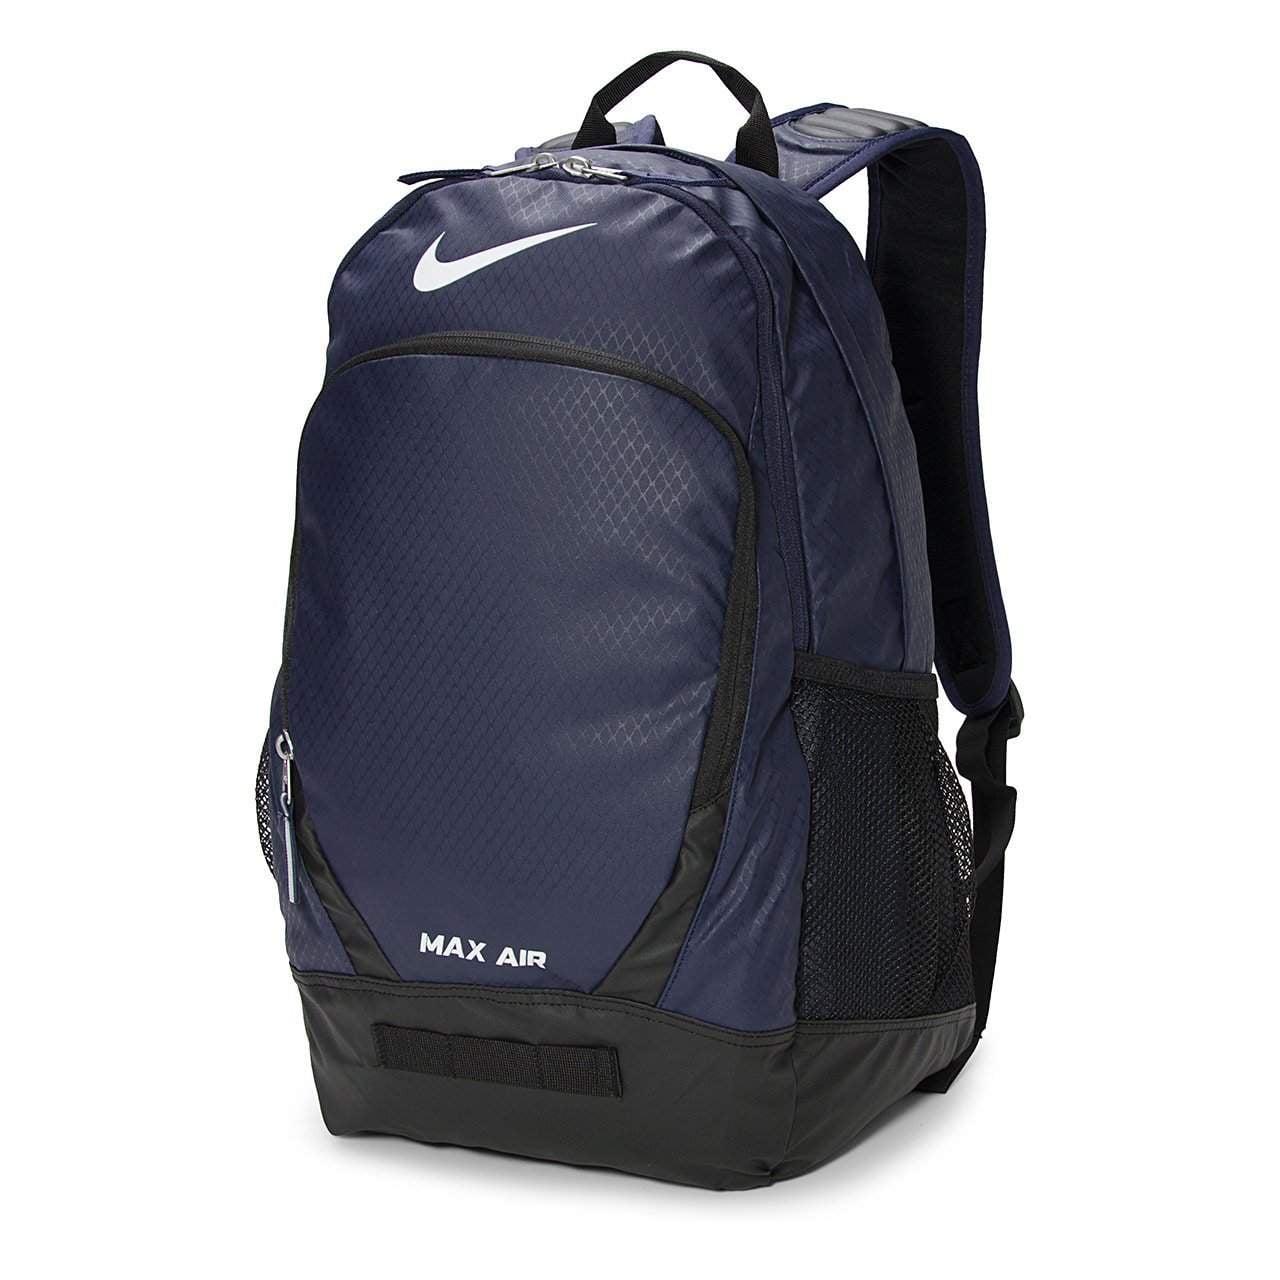 Buy Nike Team Training Max Air Backpack